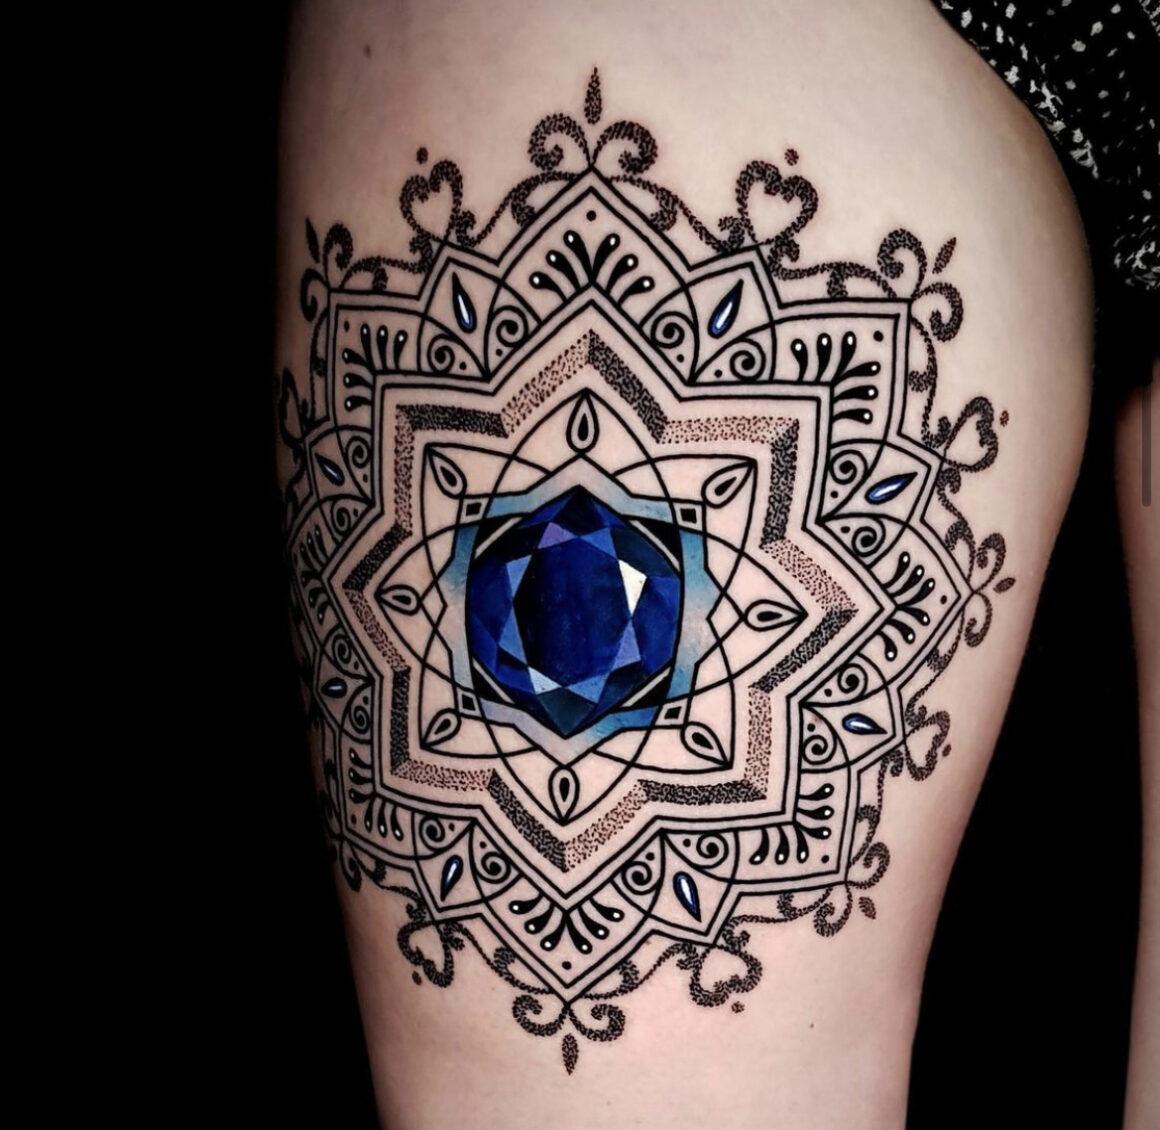 Coen Mitchell, Tattoo Gold, Auckland, New Zealand